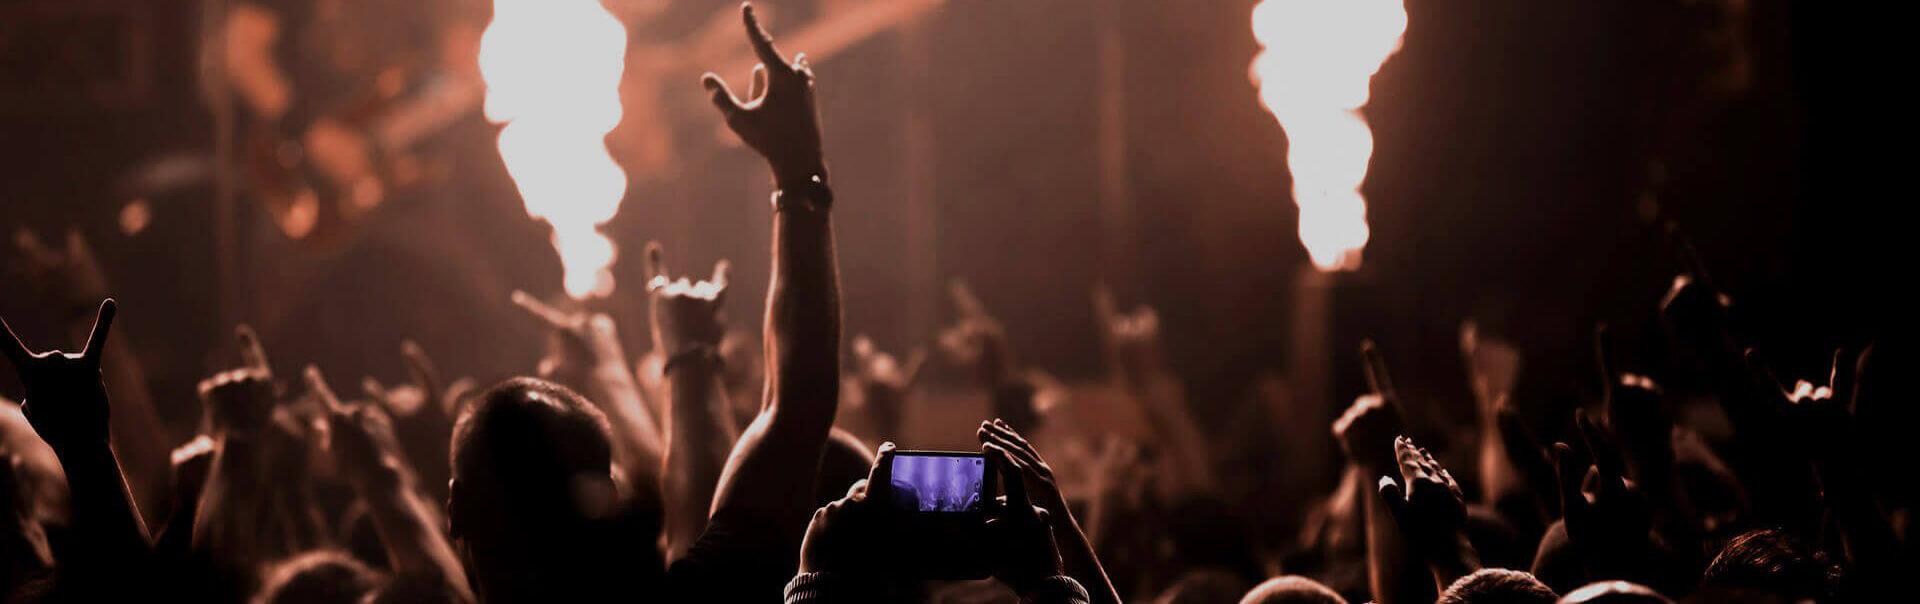 Фото для ютуба толпа на музыкальном рок концерте